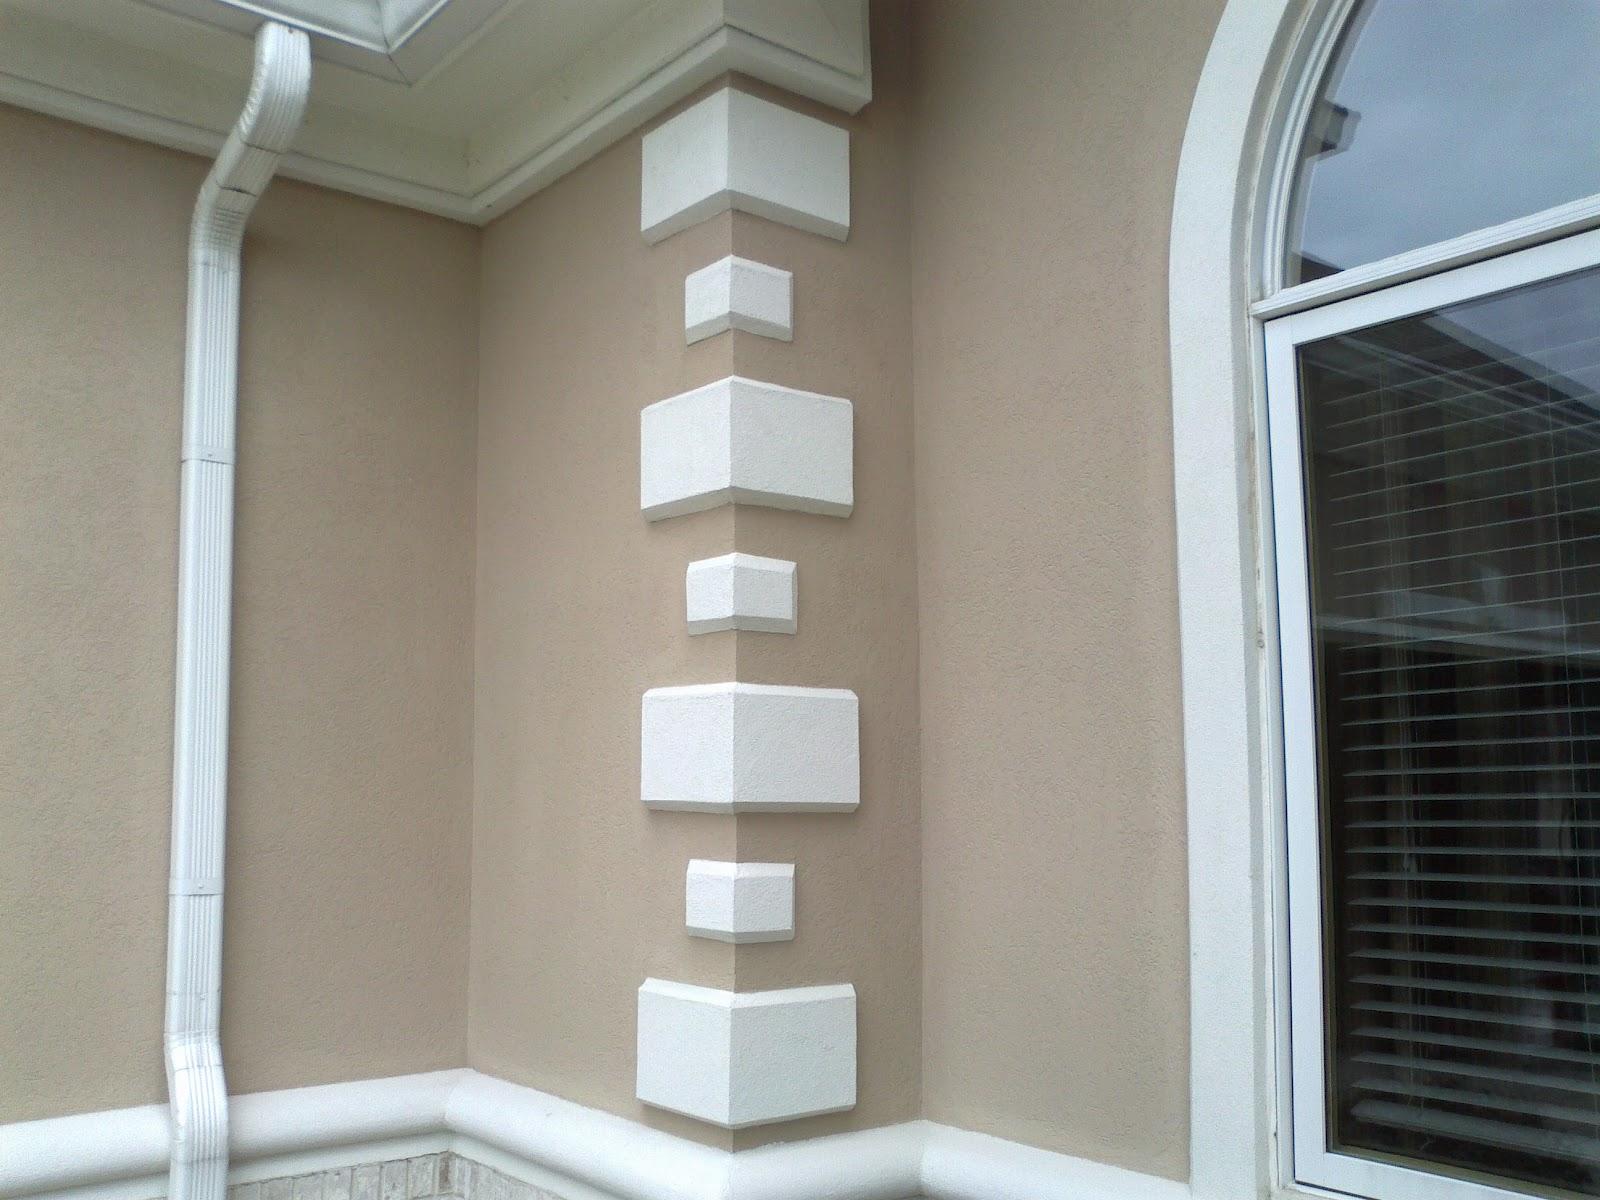 Indiana dryvit contractors Exterior wall plaster design